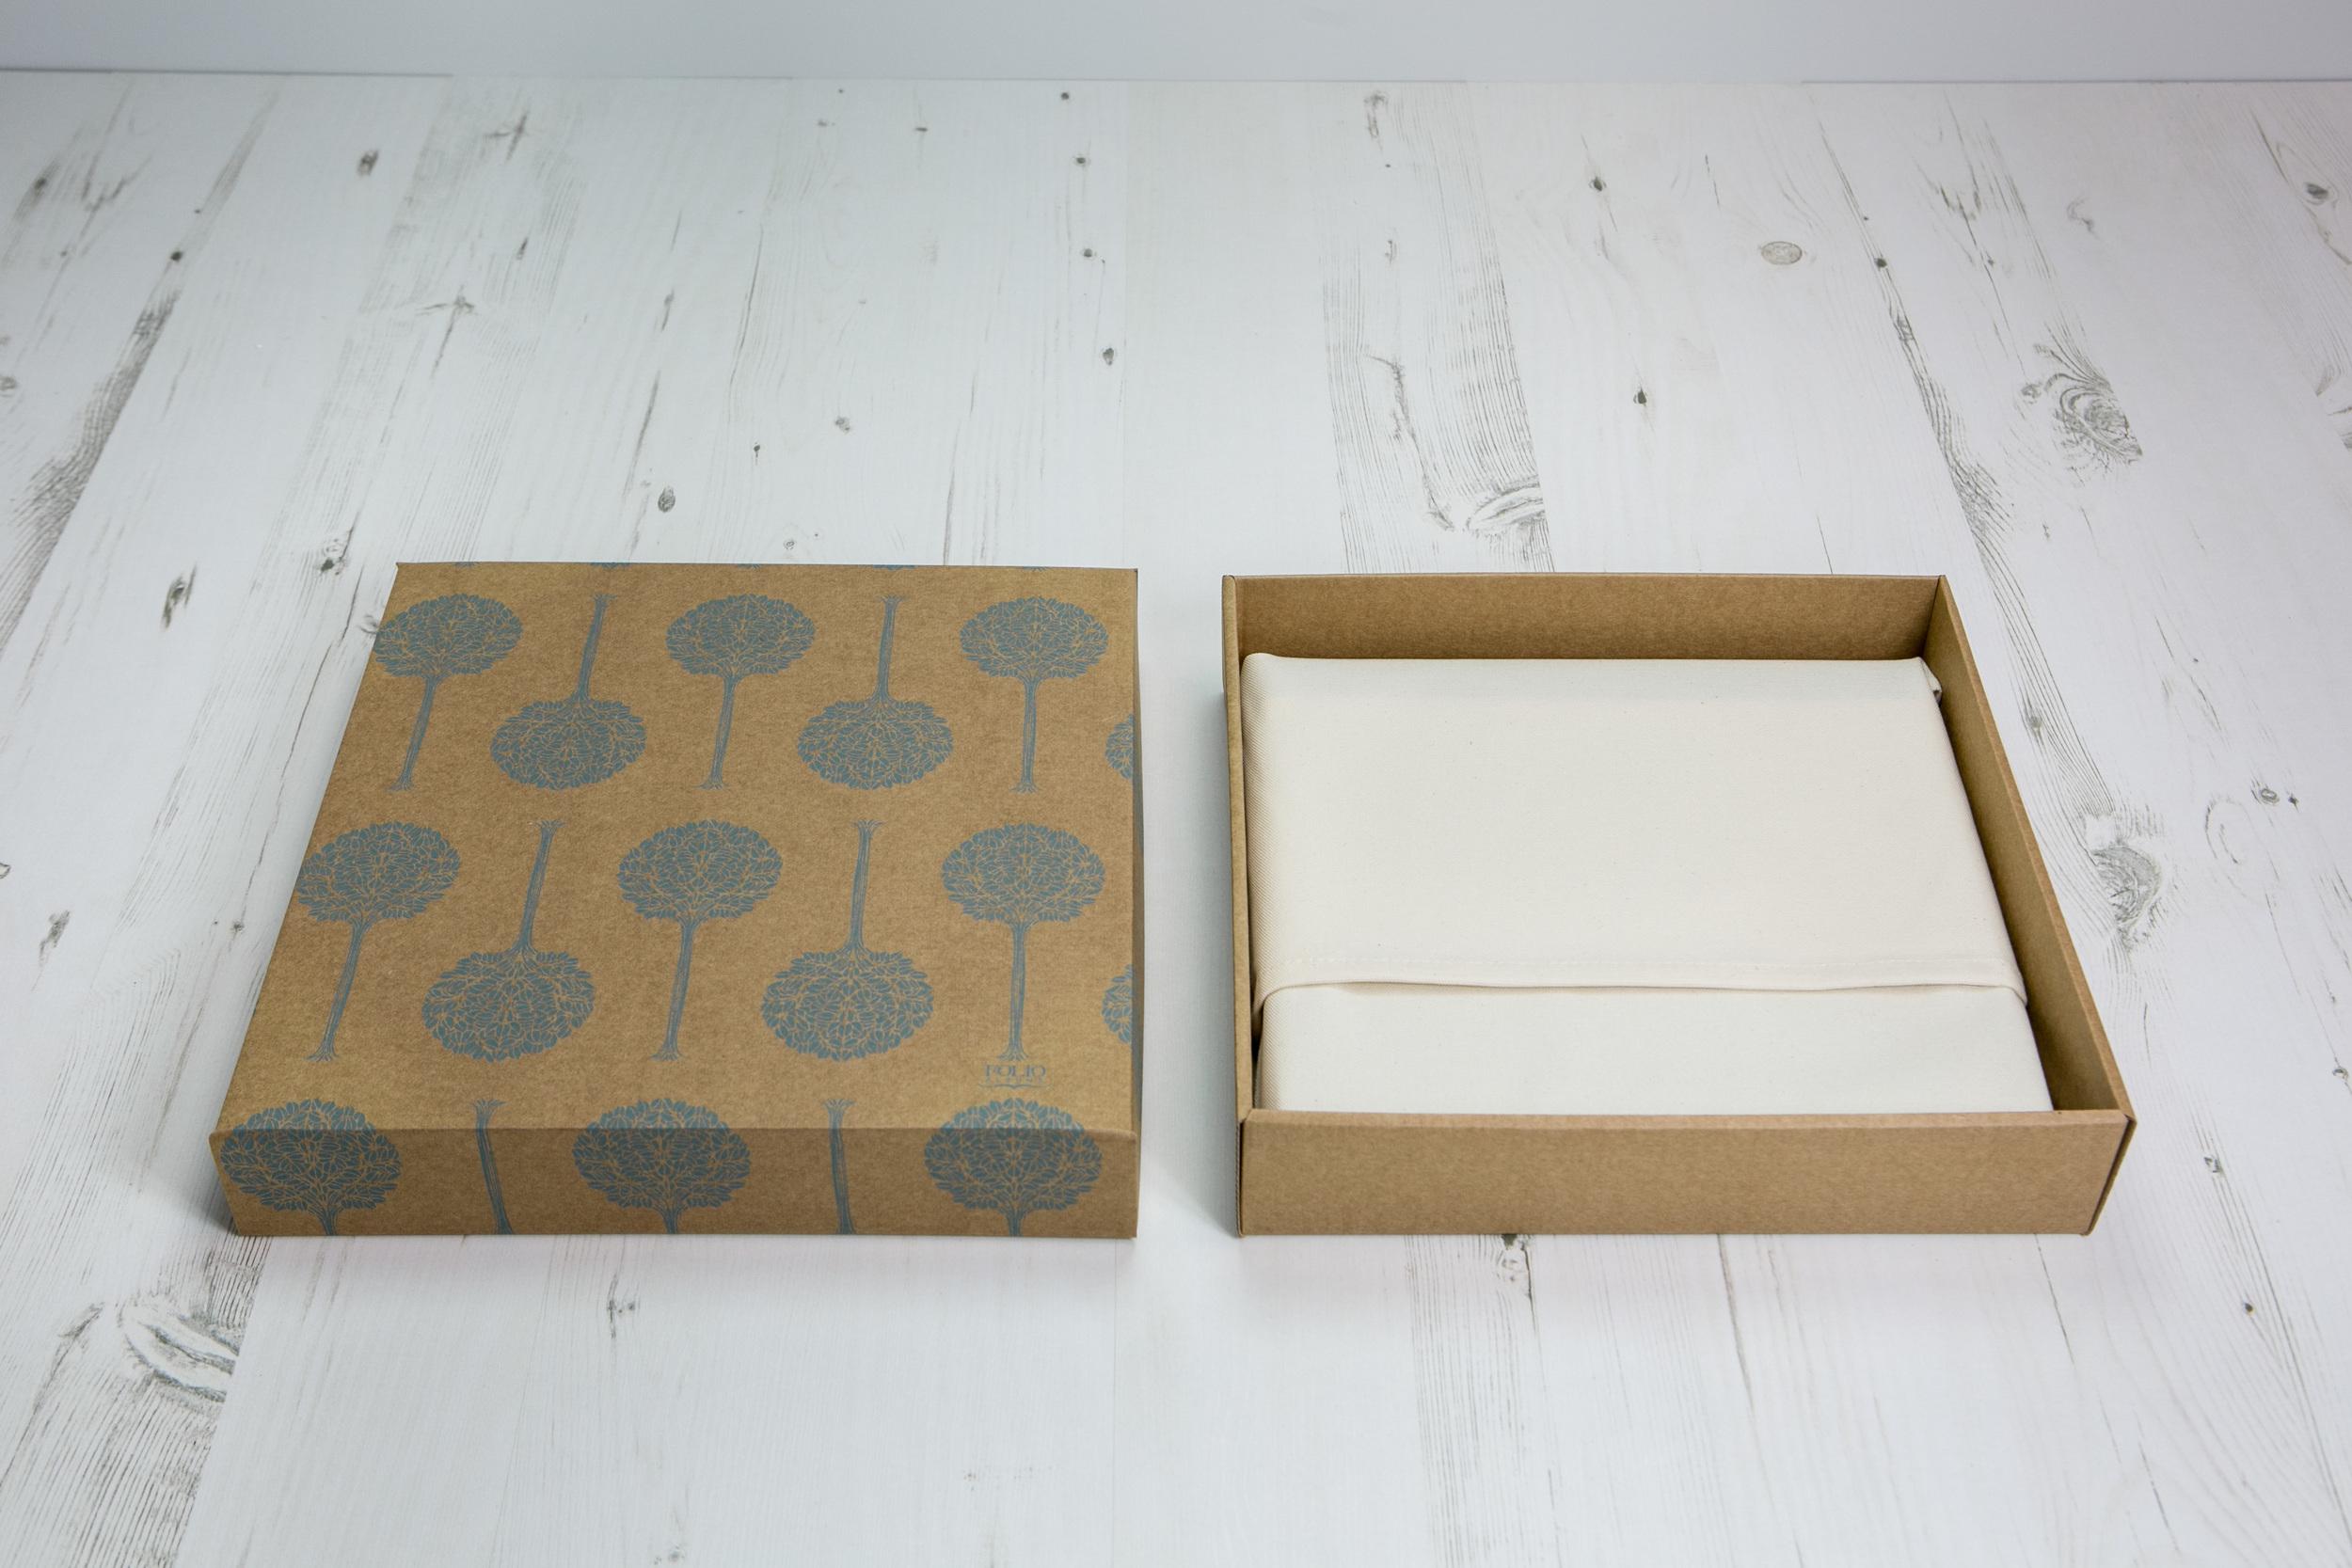 folio_albums_presentation_box_003.jpg